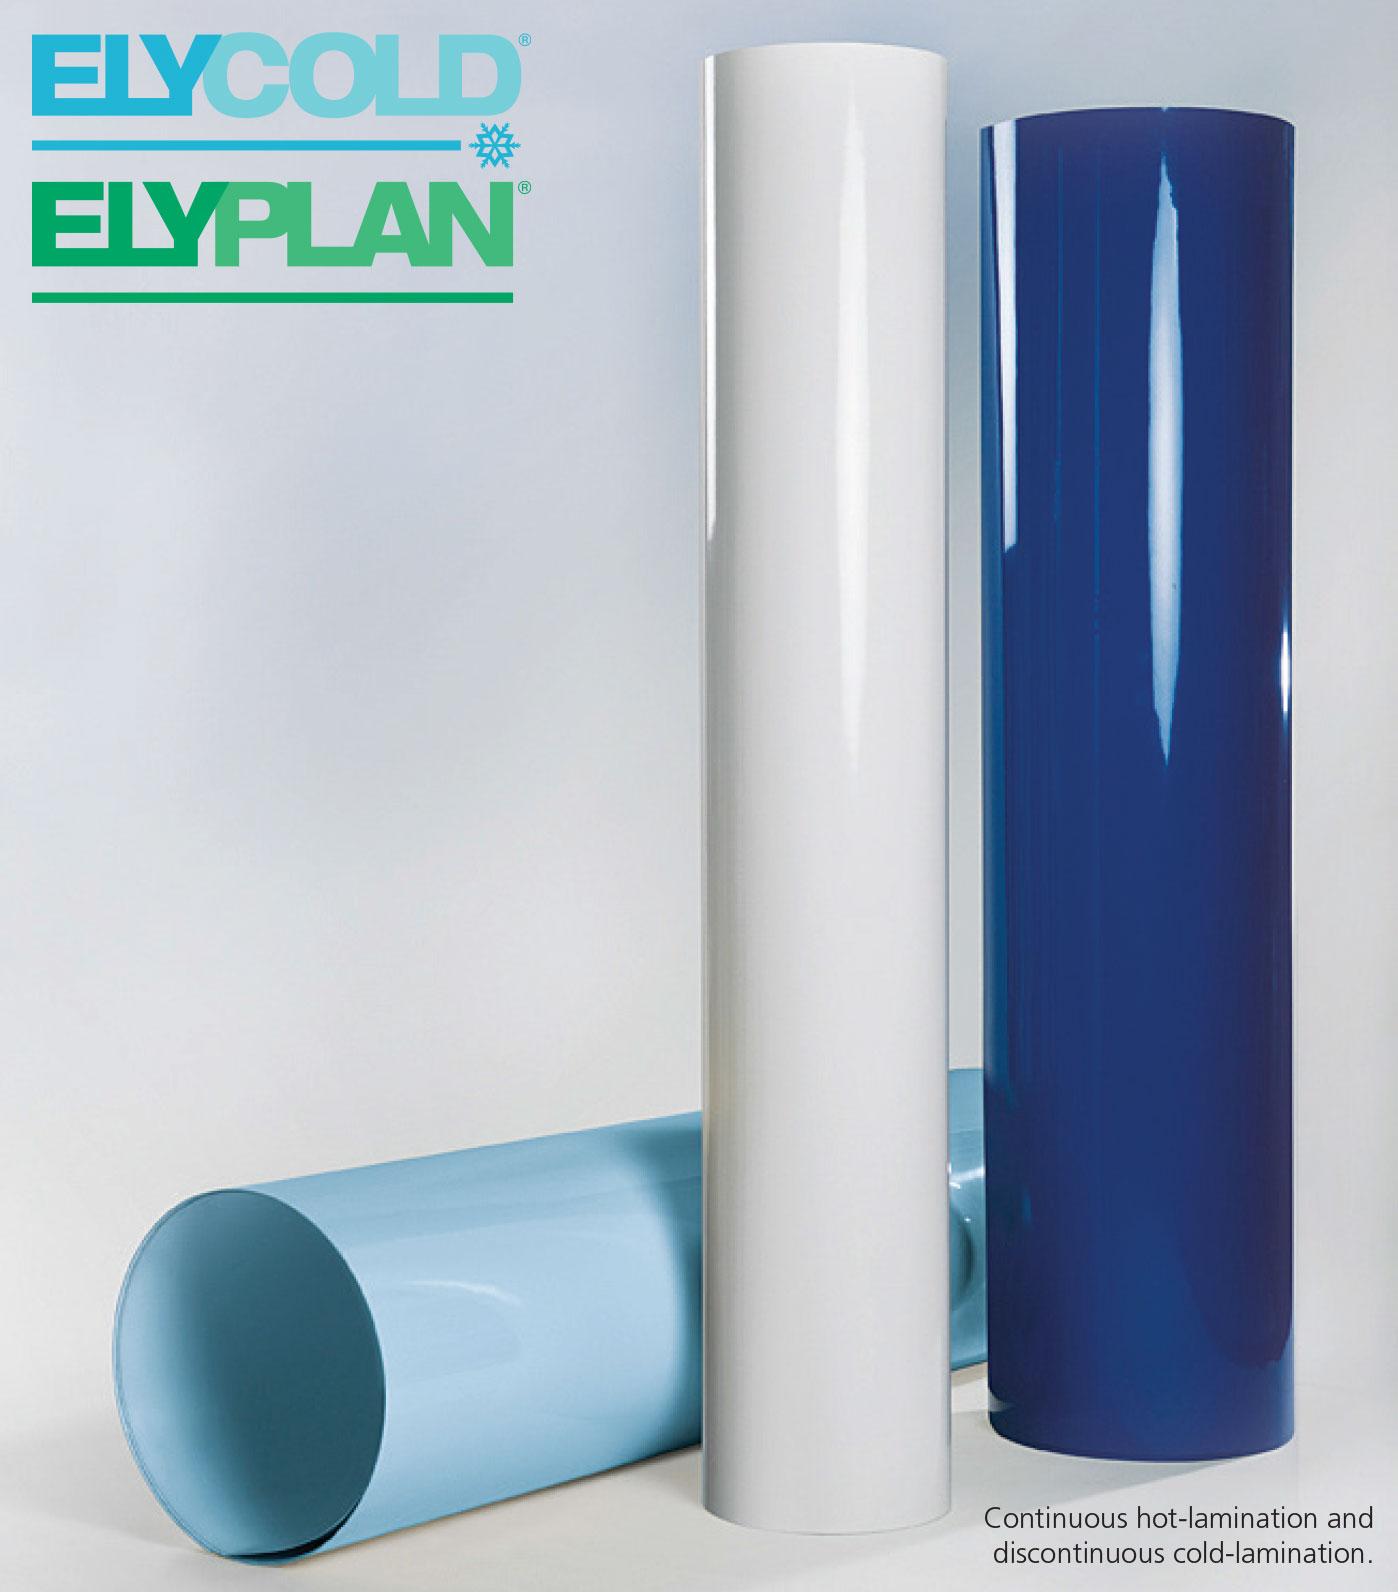 Brianza Plastica Fibreglass: Elycold & Elyplan